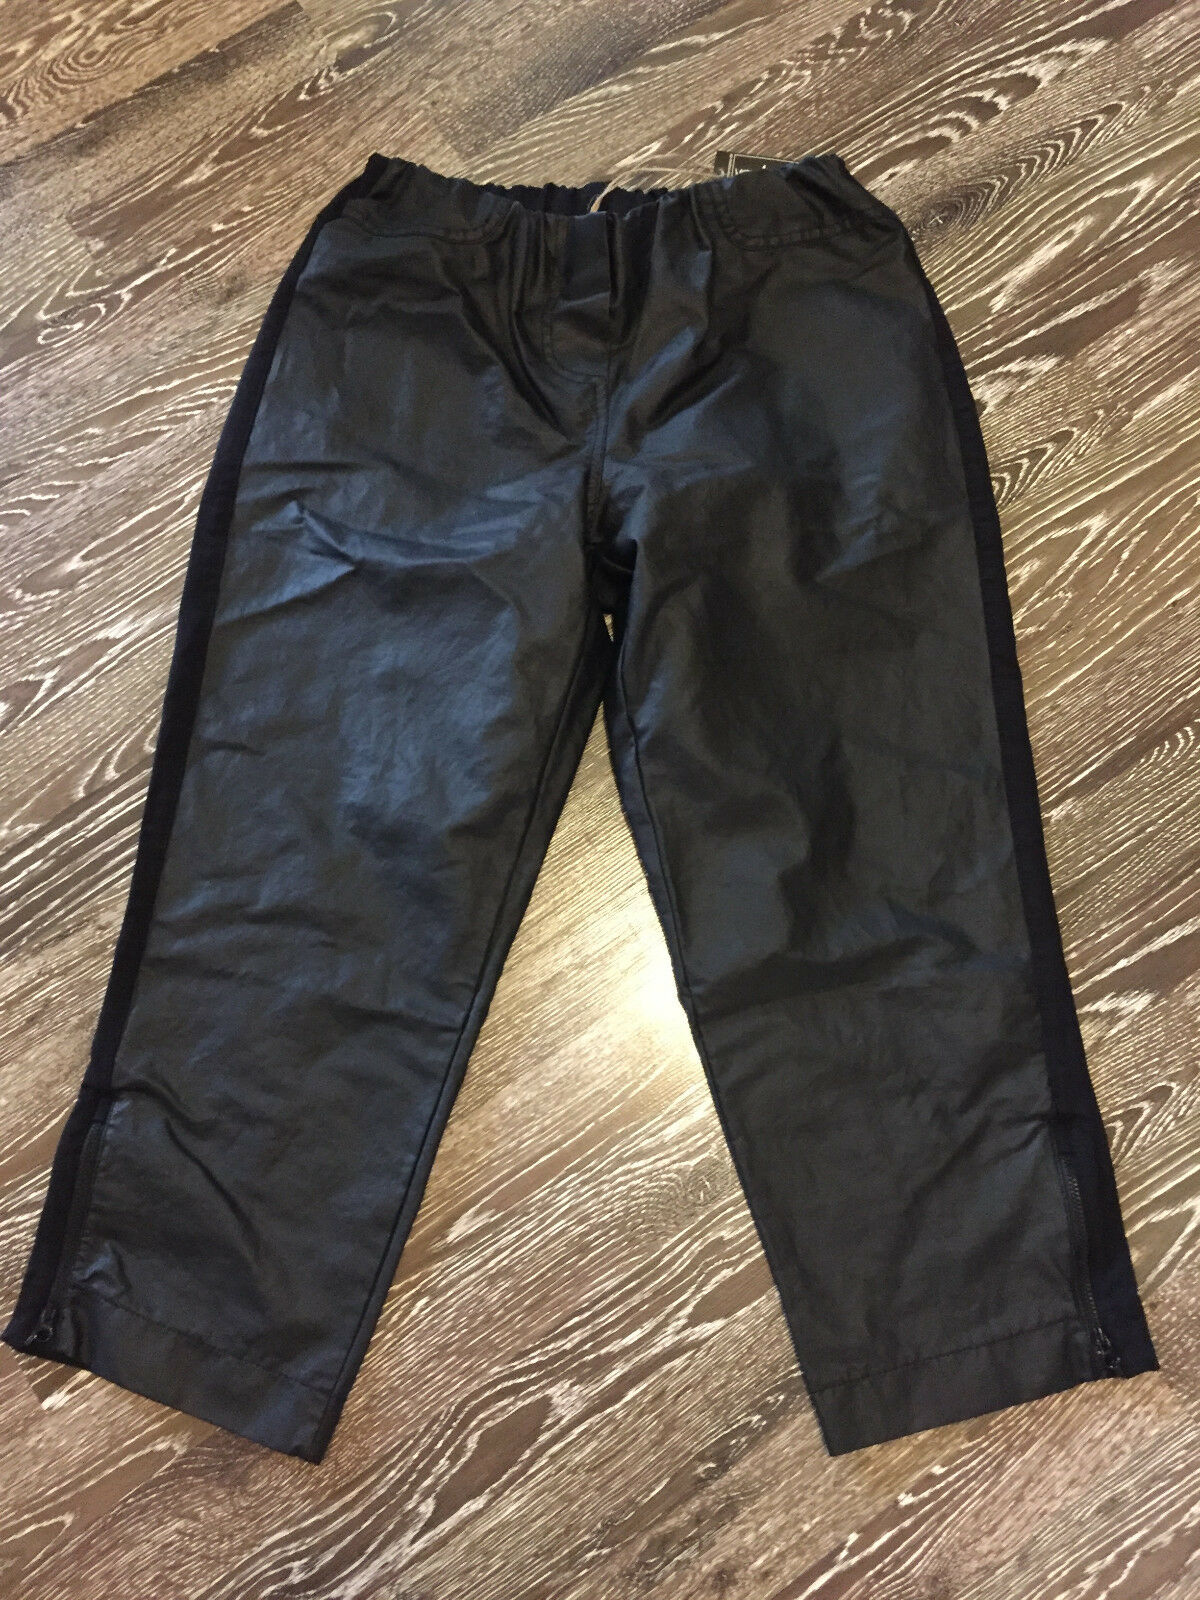 Barbara Speer Lagenlook  Stretch Hose Material Mix in black NEU Gr.4